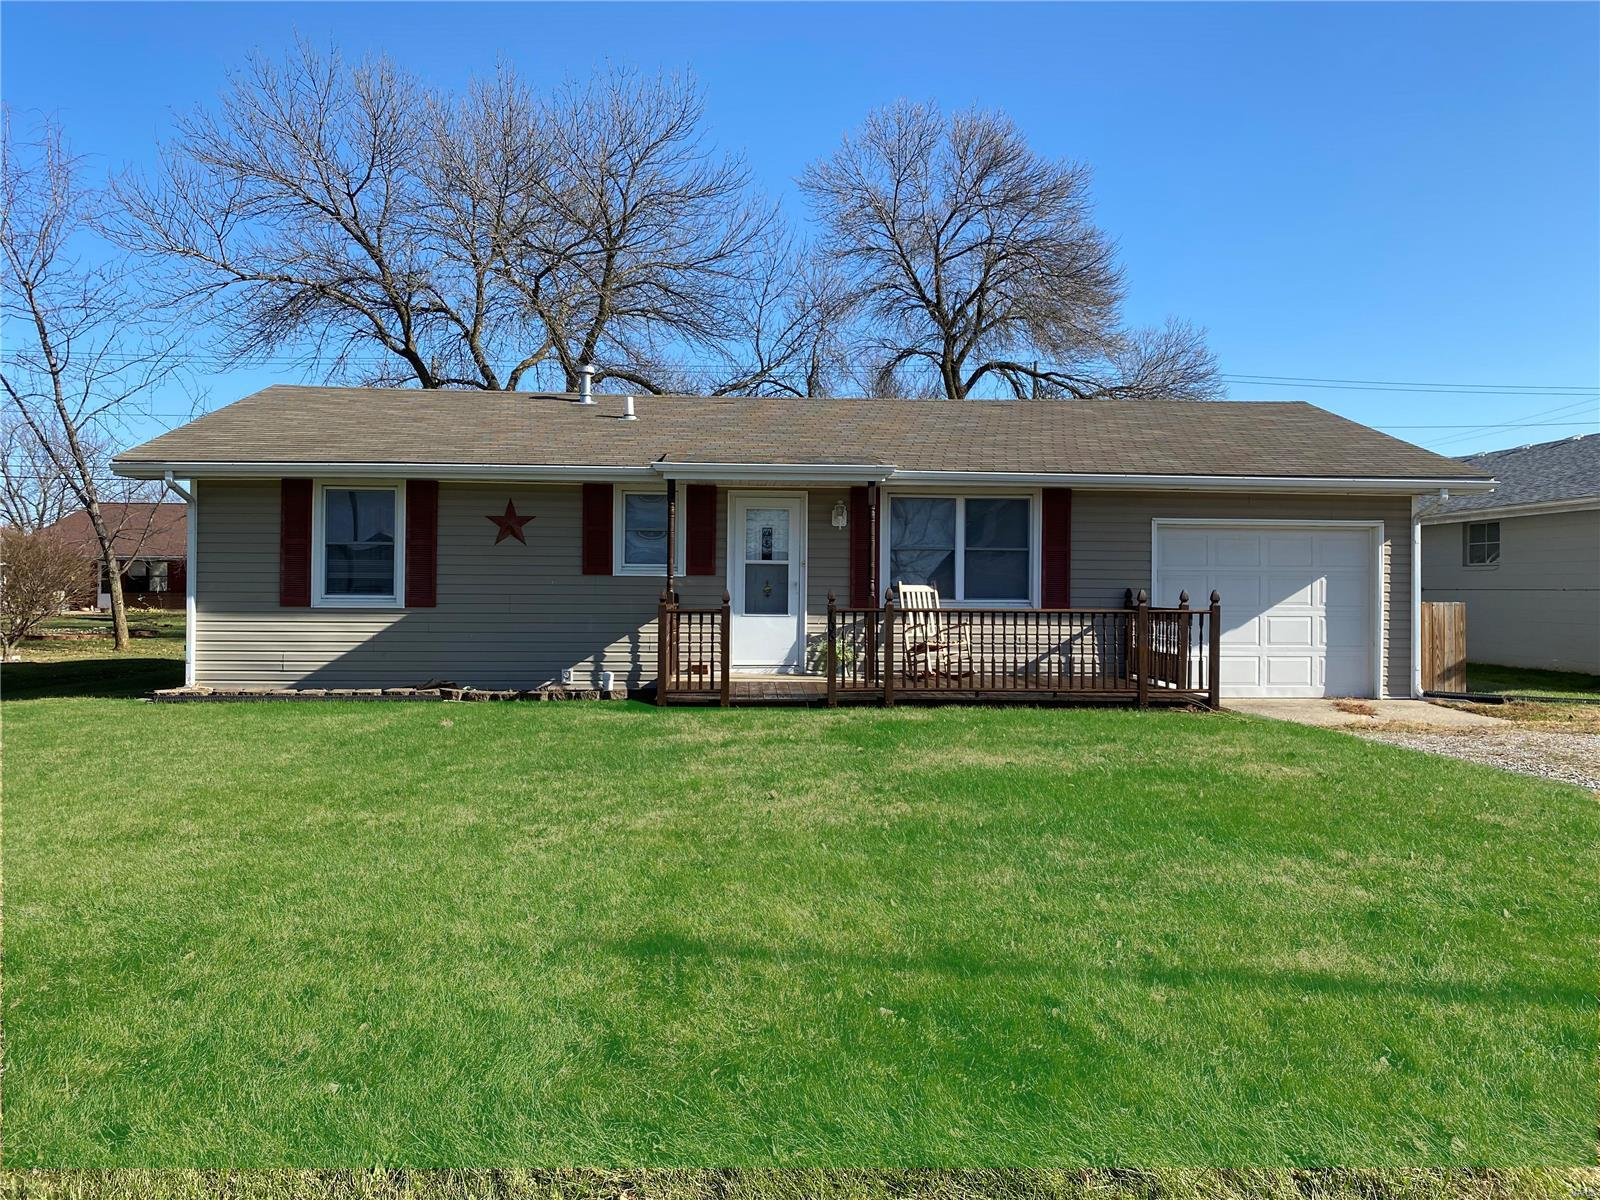 706 N Allen Property Photo - Centralia, MO real estate listing